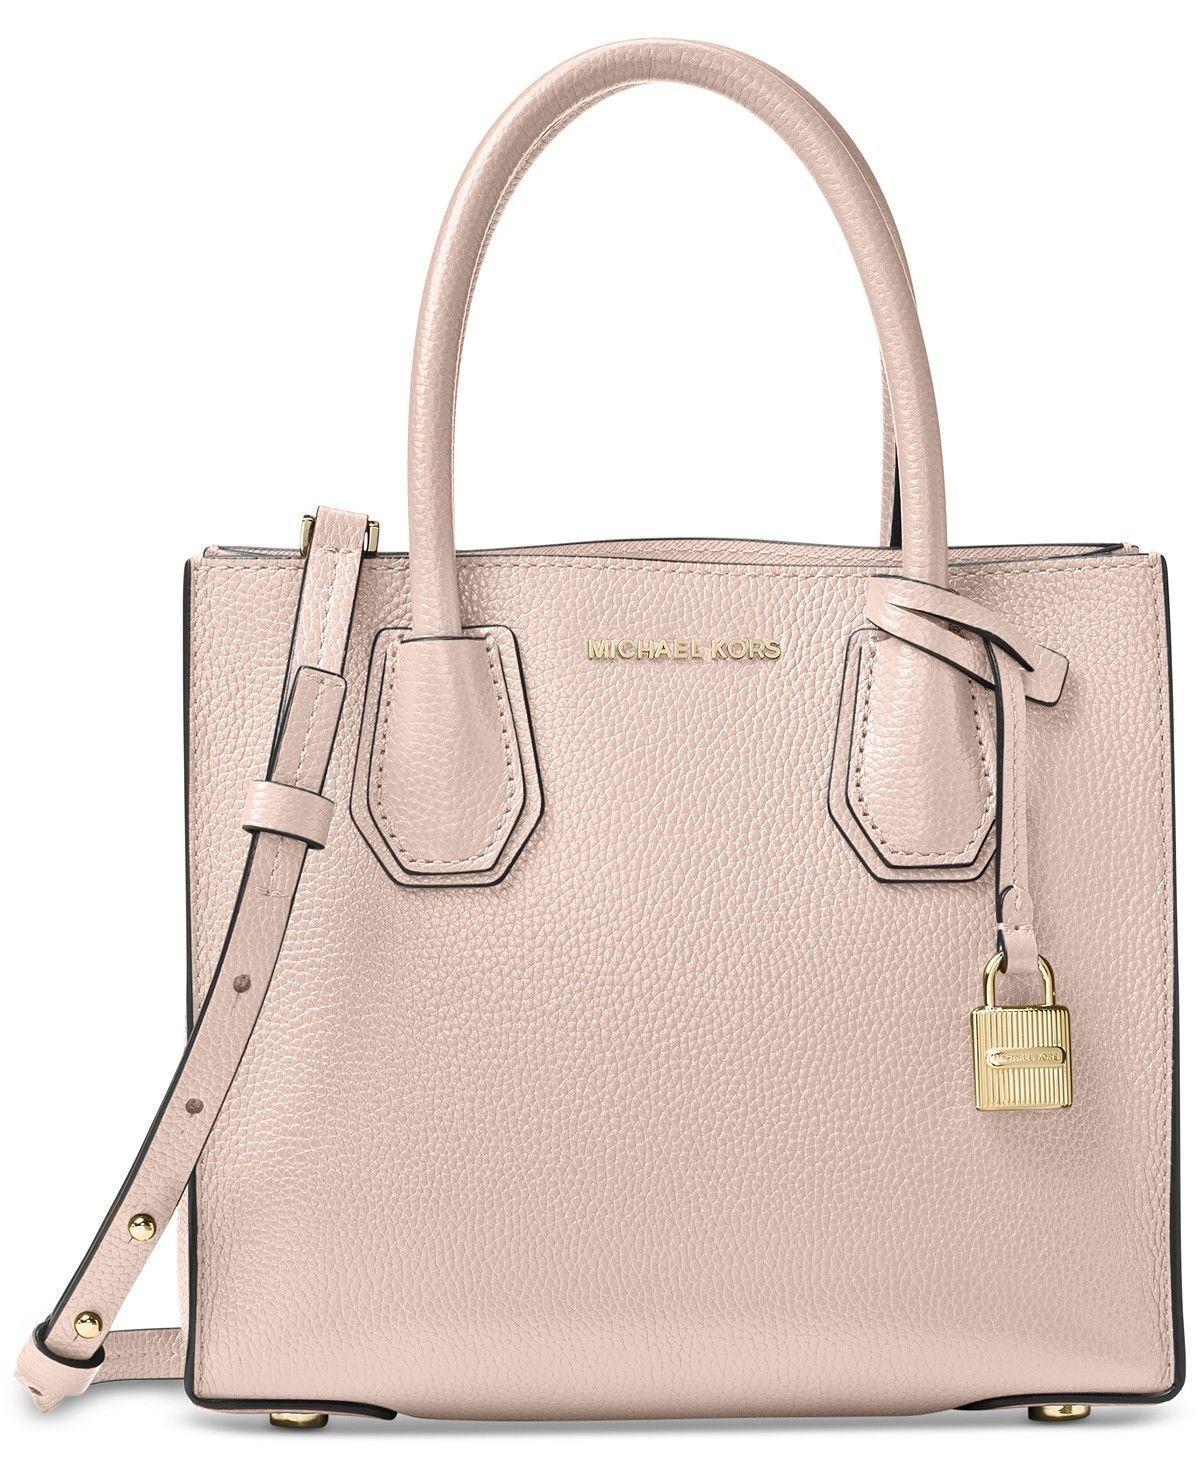 4dc297ca031b Michael Kors Mercer Soft Pink Leather Medium Satchel Handbag ...